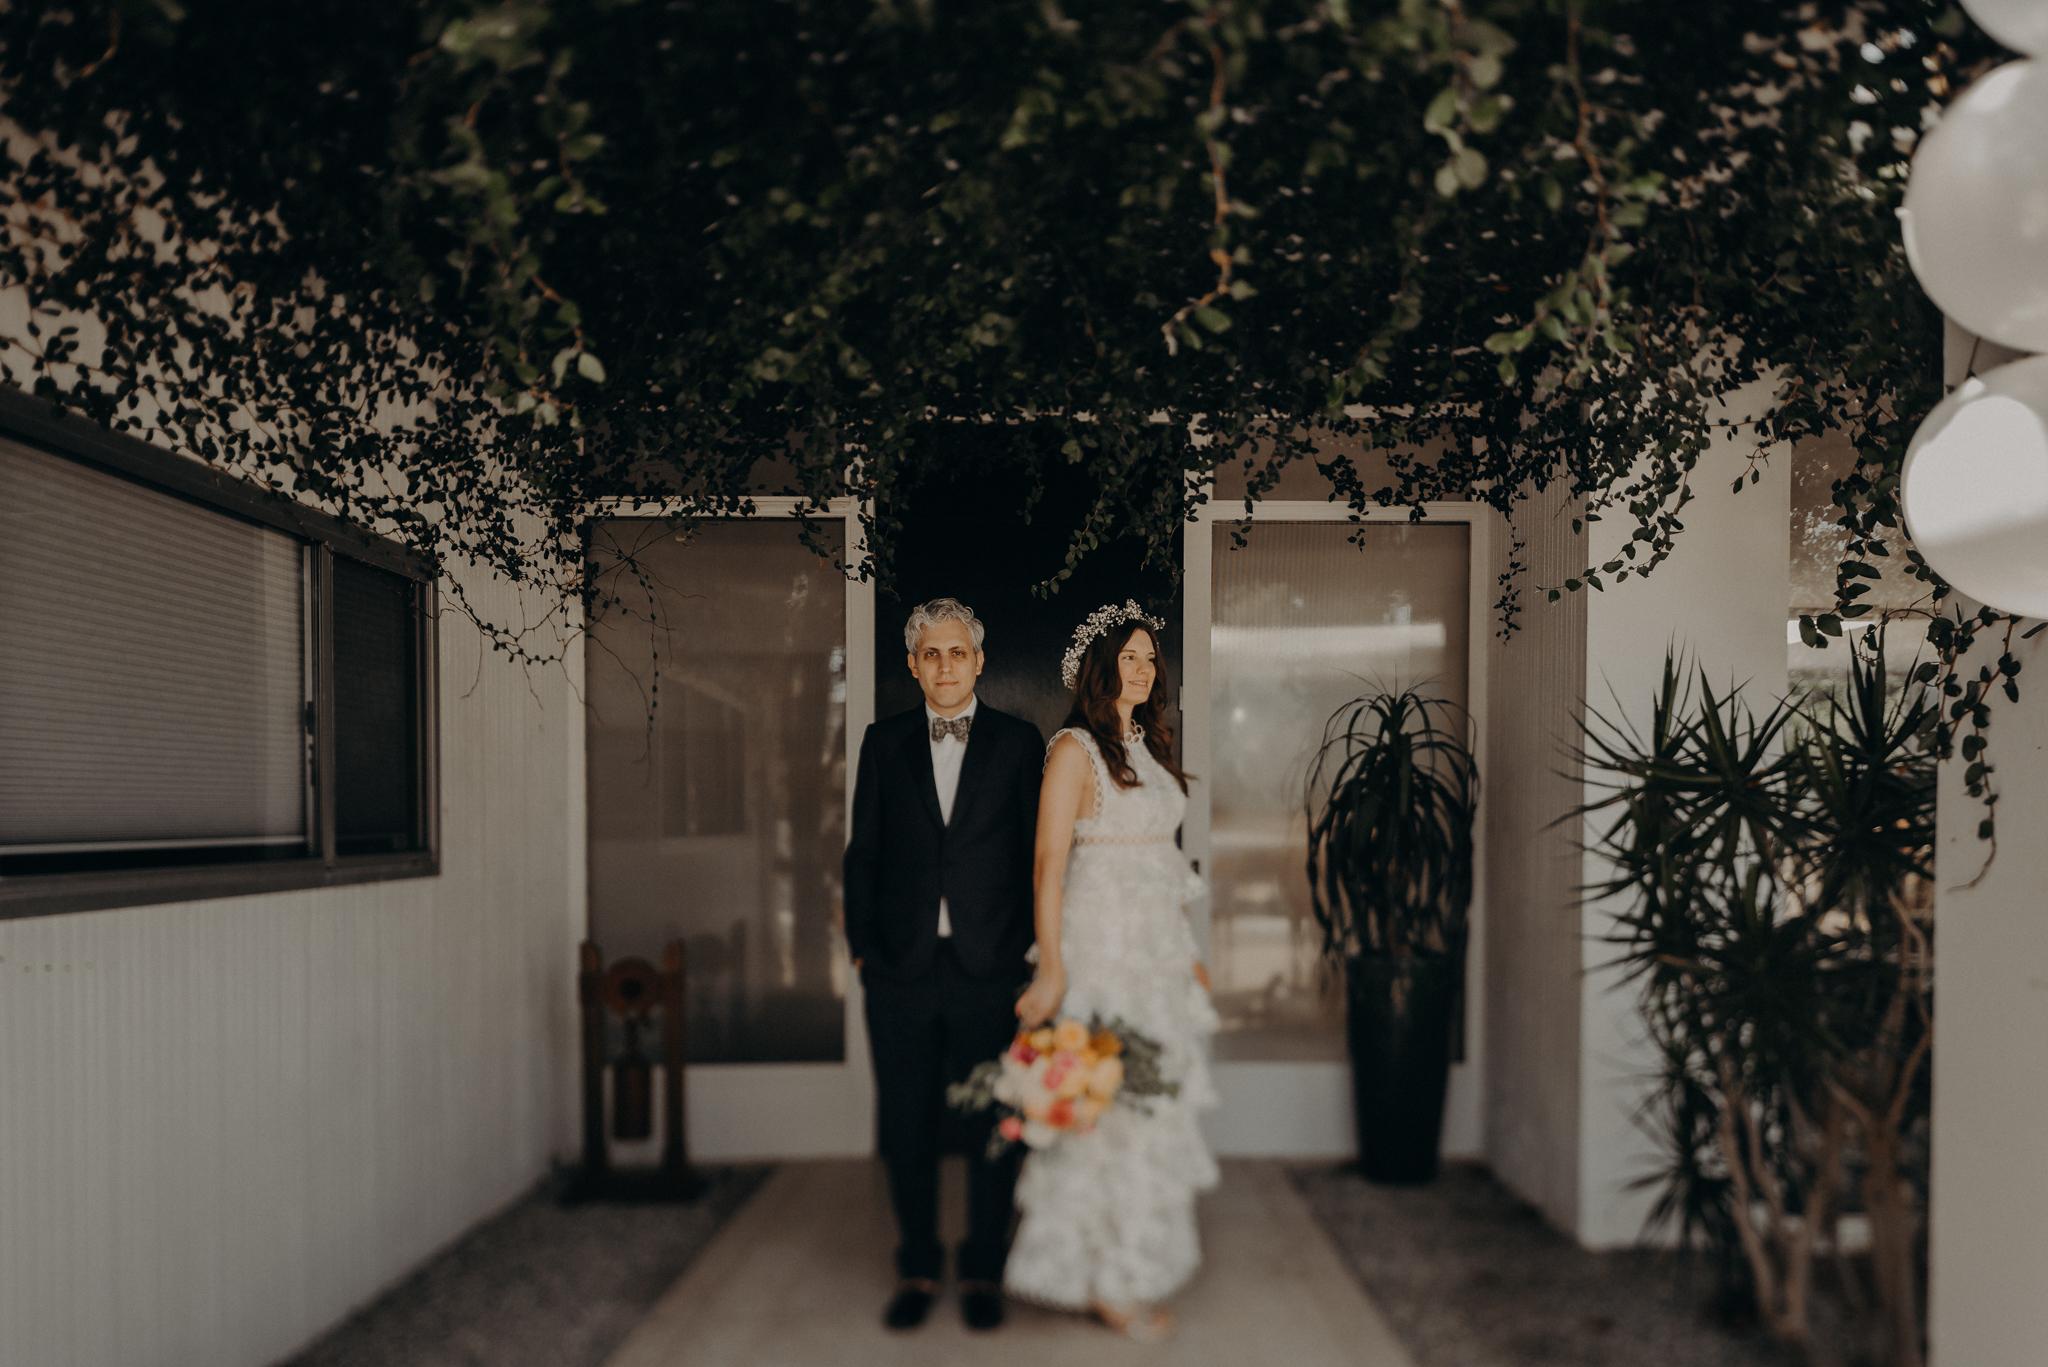 Isaiah + Taylor Photography - Private Estate Backyard Wedding - Beverly Hills - Los Angeles Wedding Photographer - 20.jpg